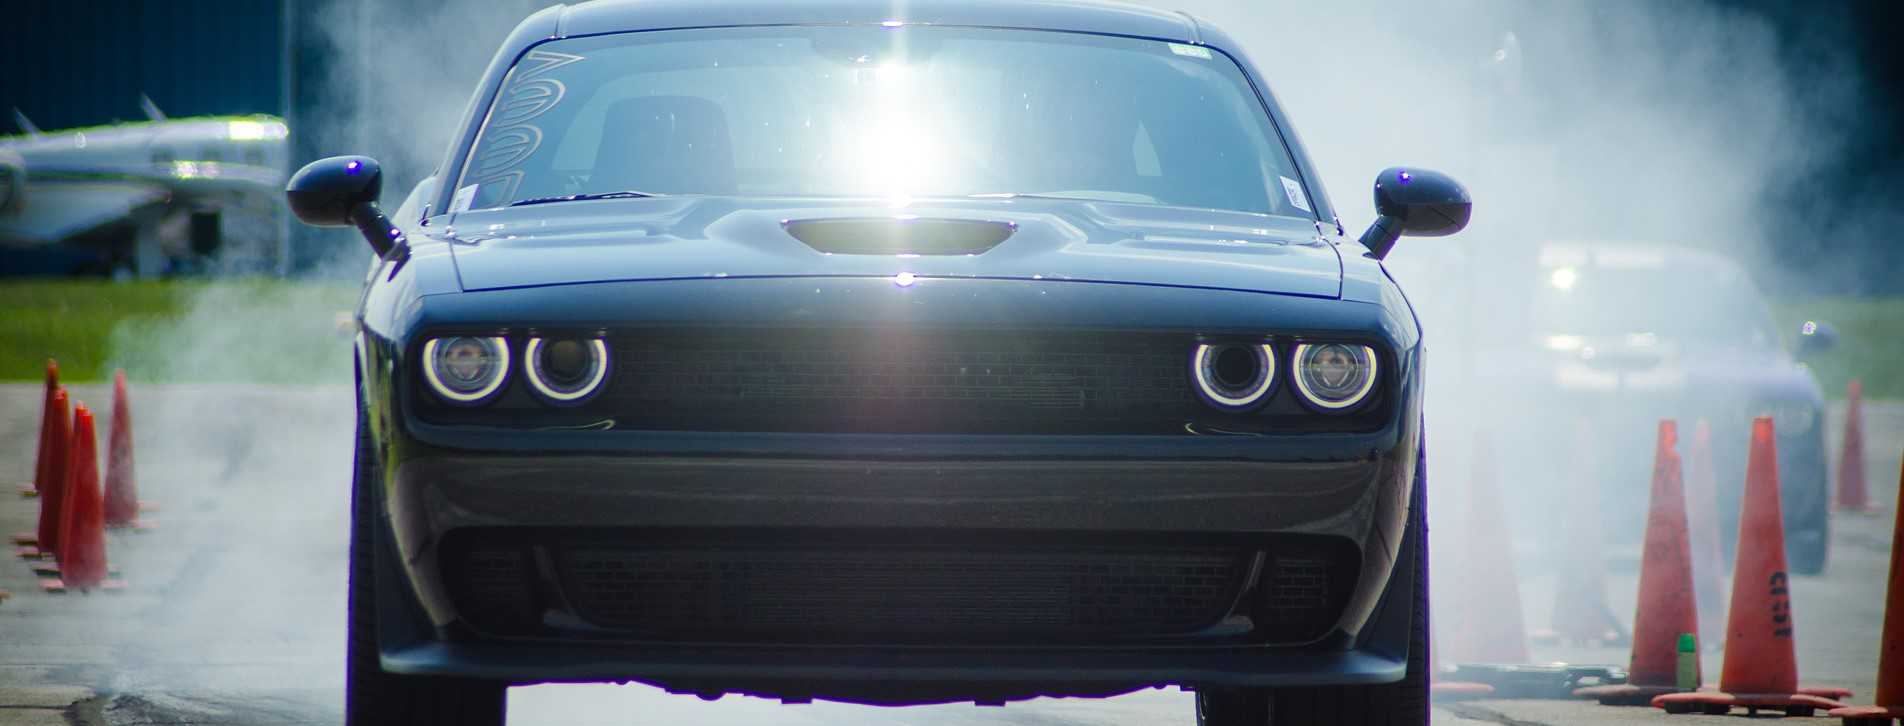 Dodge in Jamaica, New York | Kids Car Donations